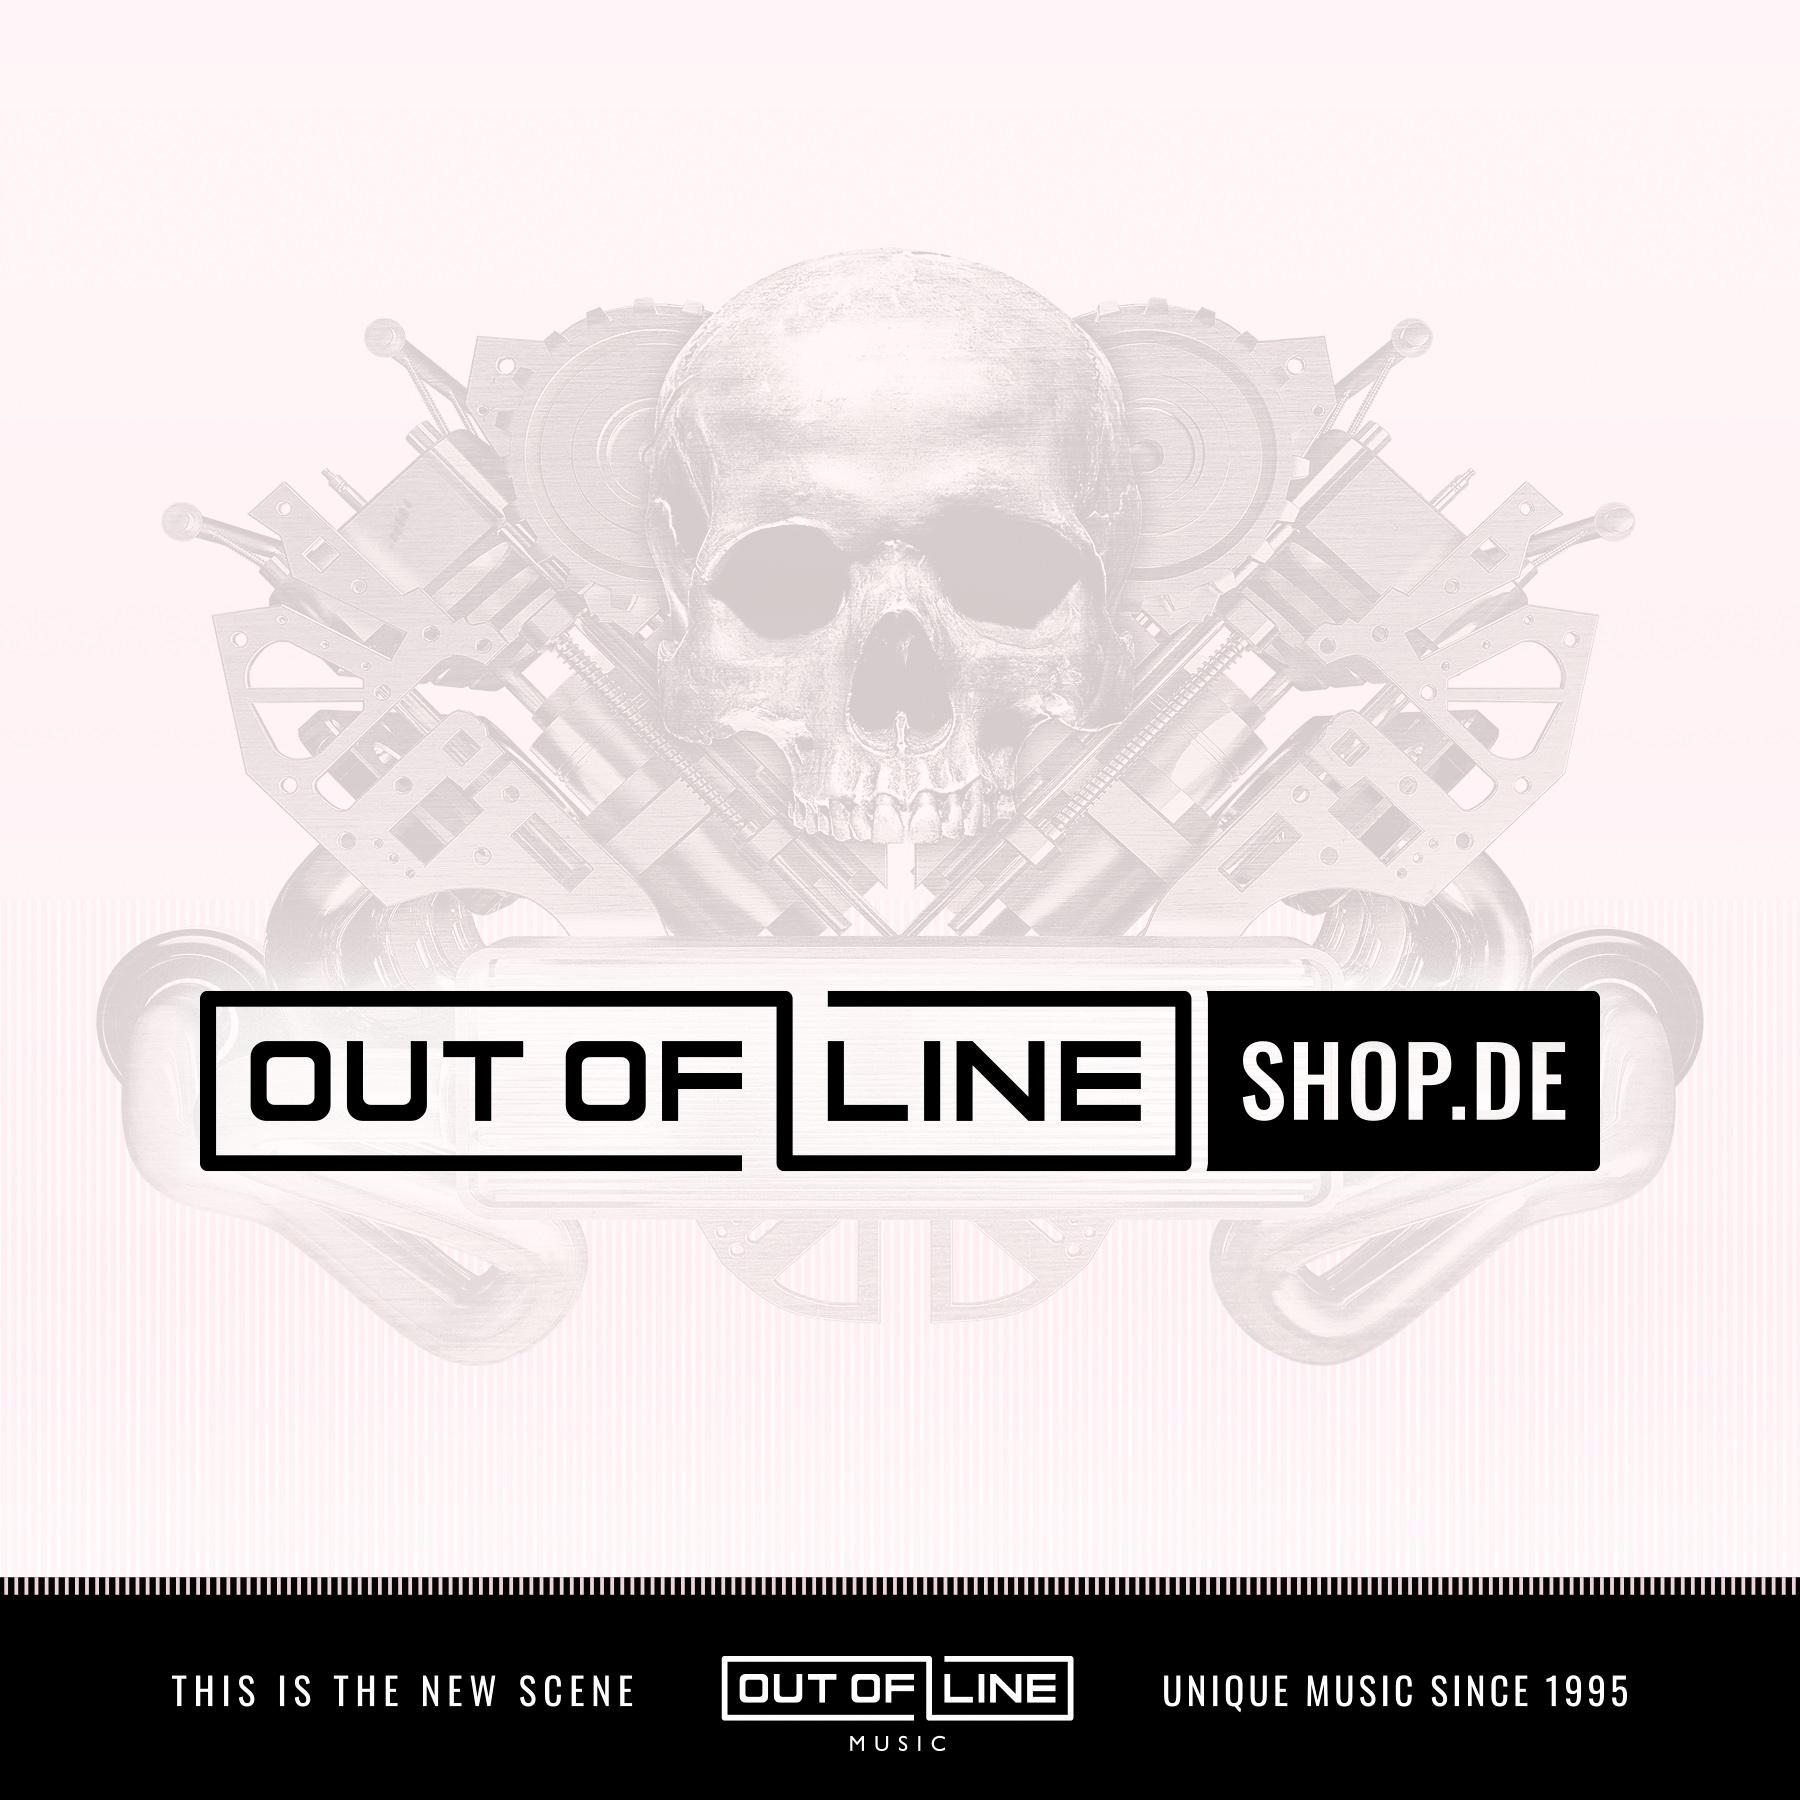 Rummelsnuff & Asbach - Äquatortaufe - Box/T-Shirt - Bundle